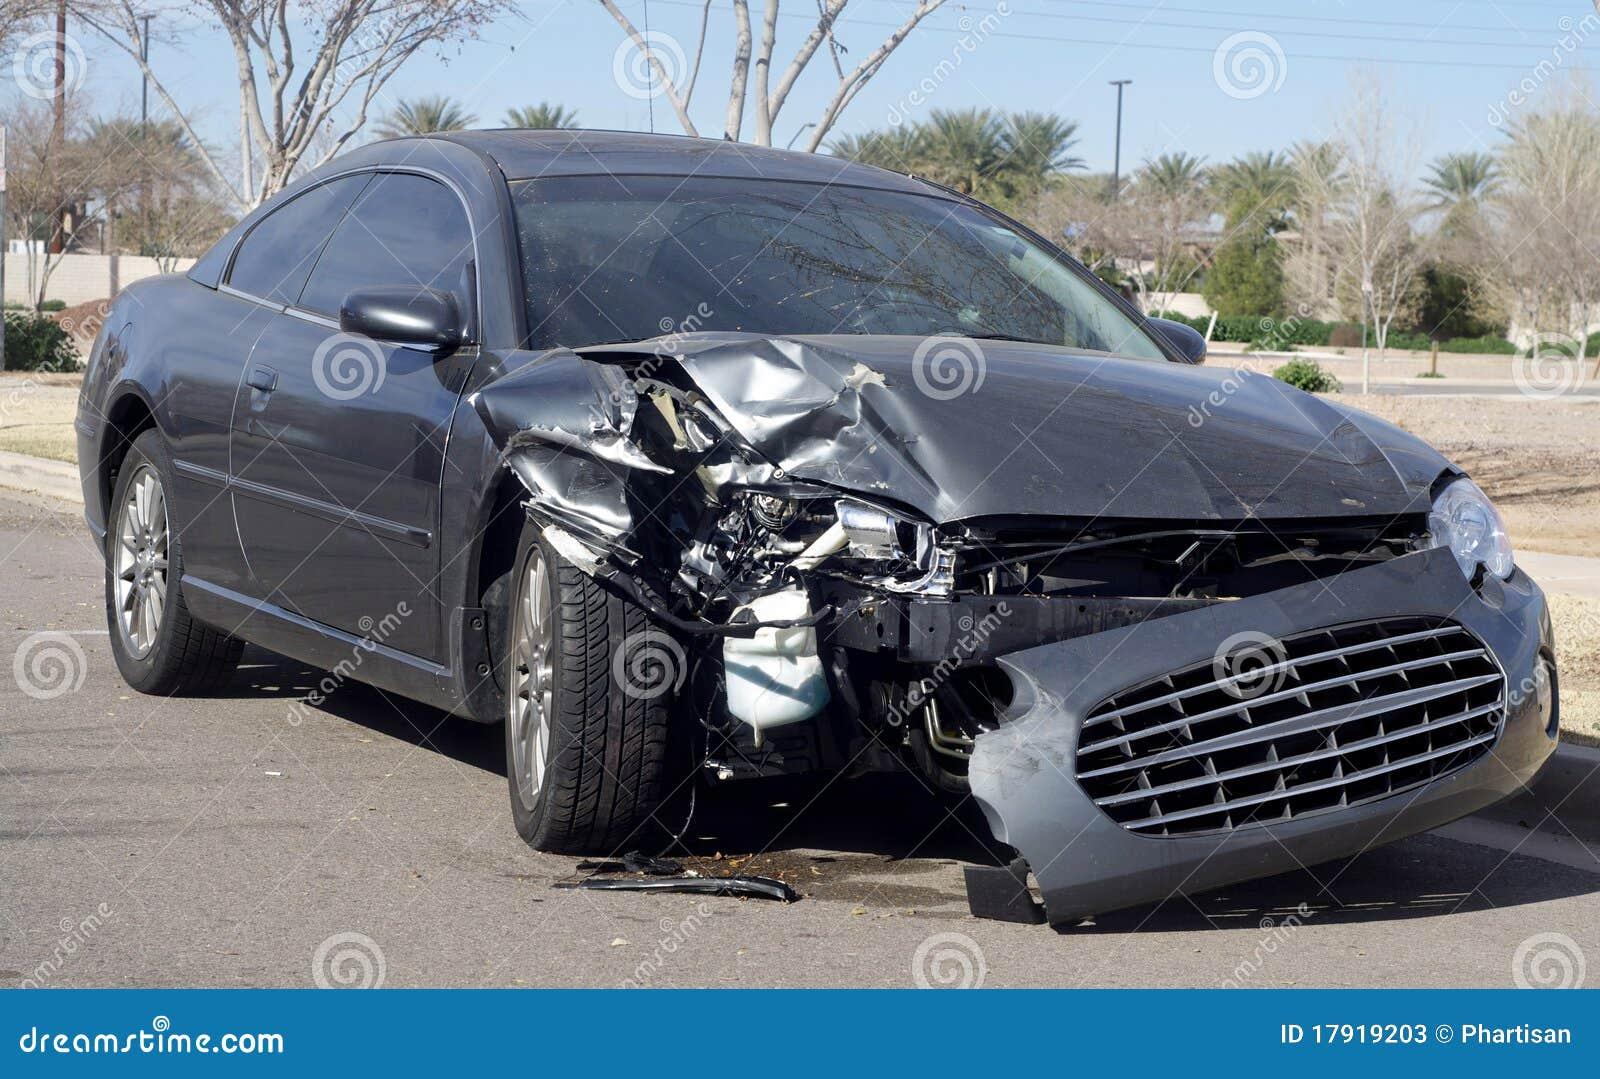 car wreck damaged after road accident stock photos image 17919203. Black Bedroom Furniture Sets. Home Design Ideas